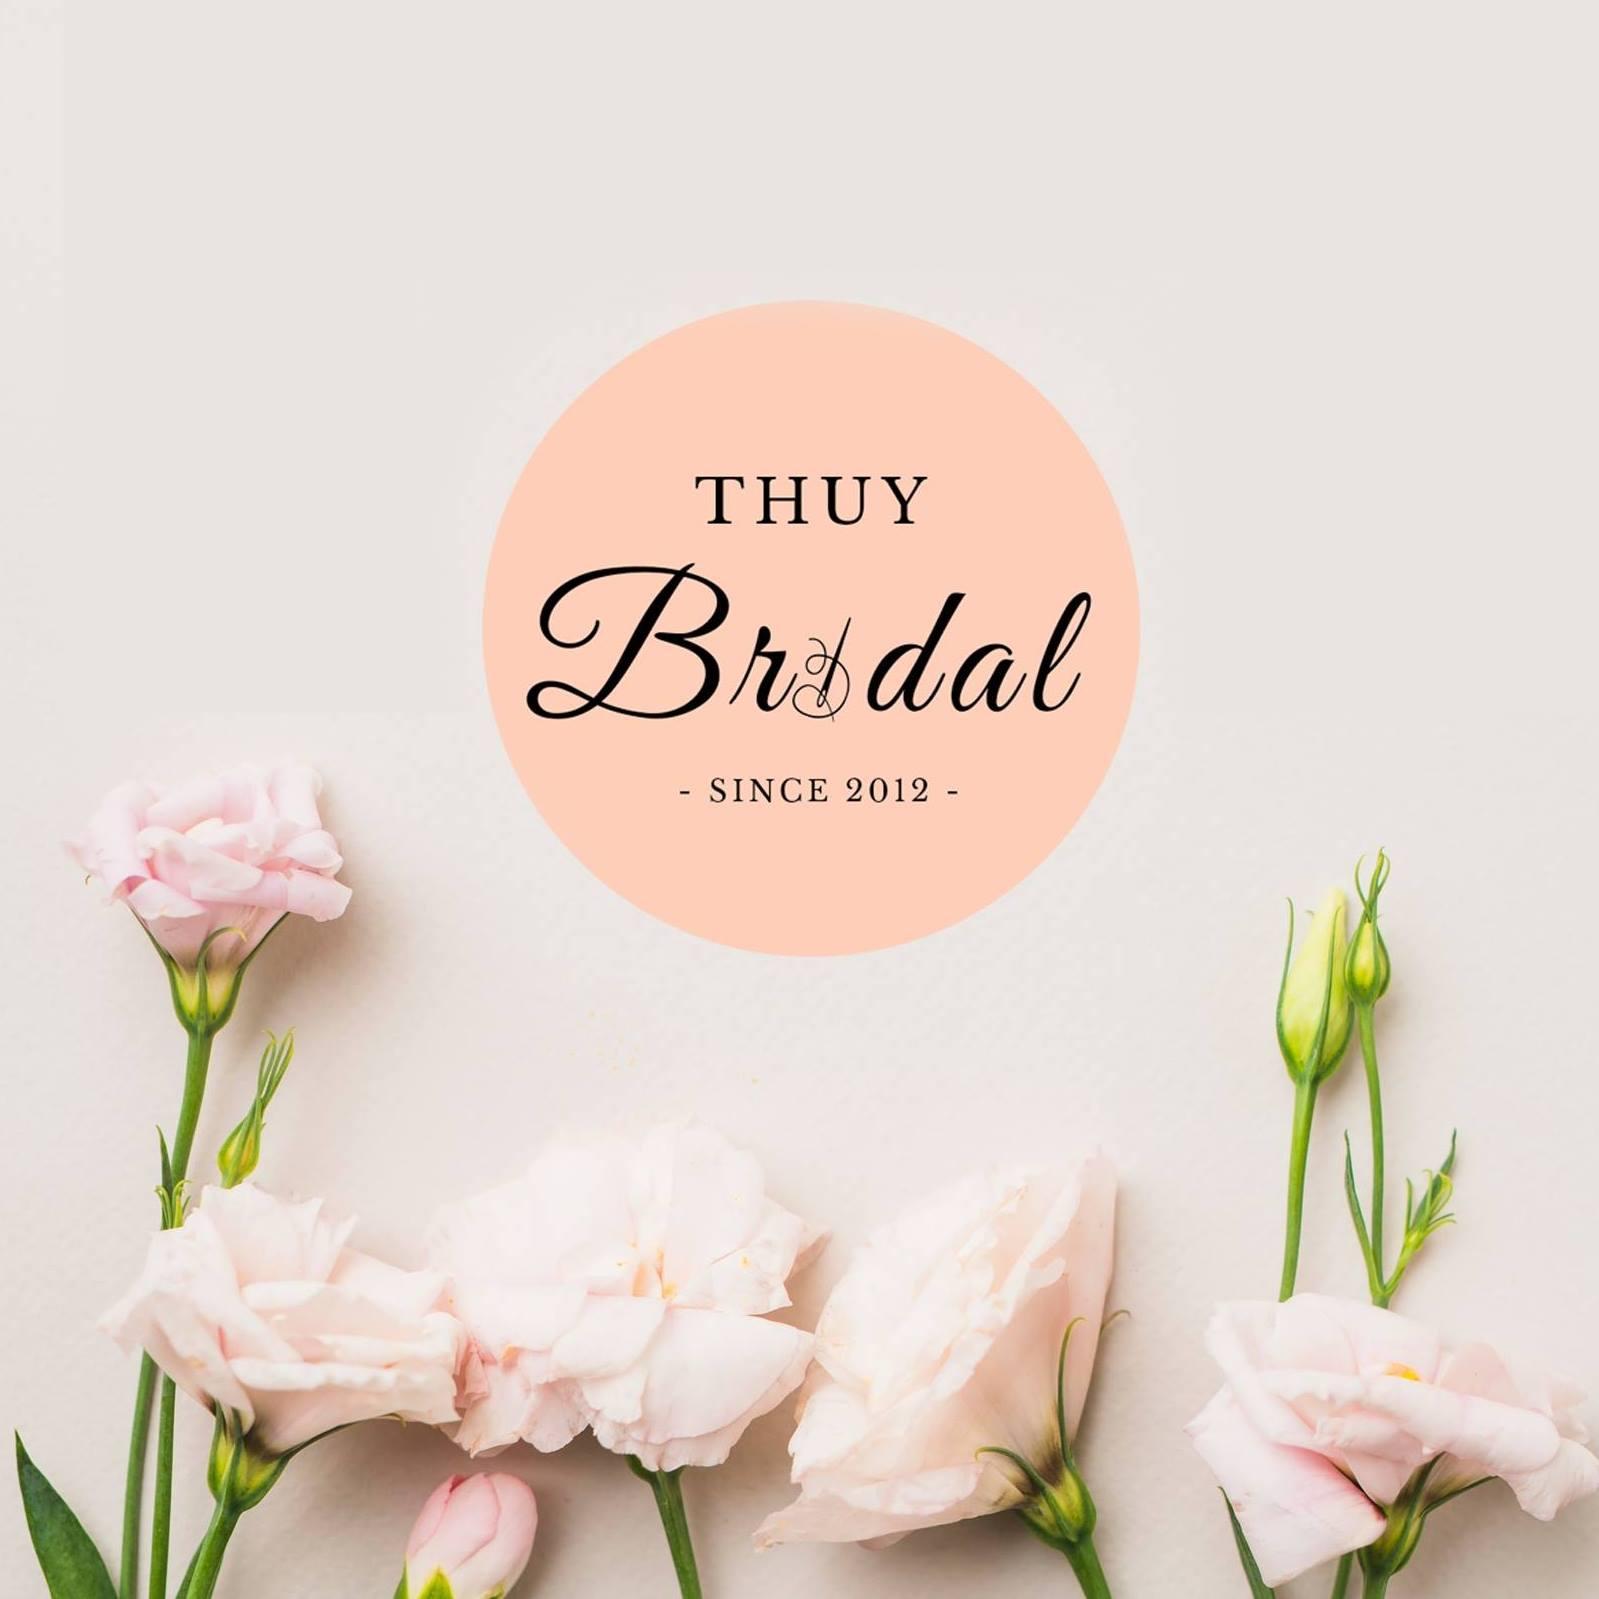 Thụy Bridal